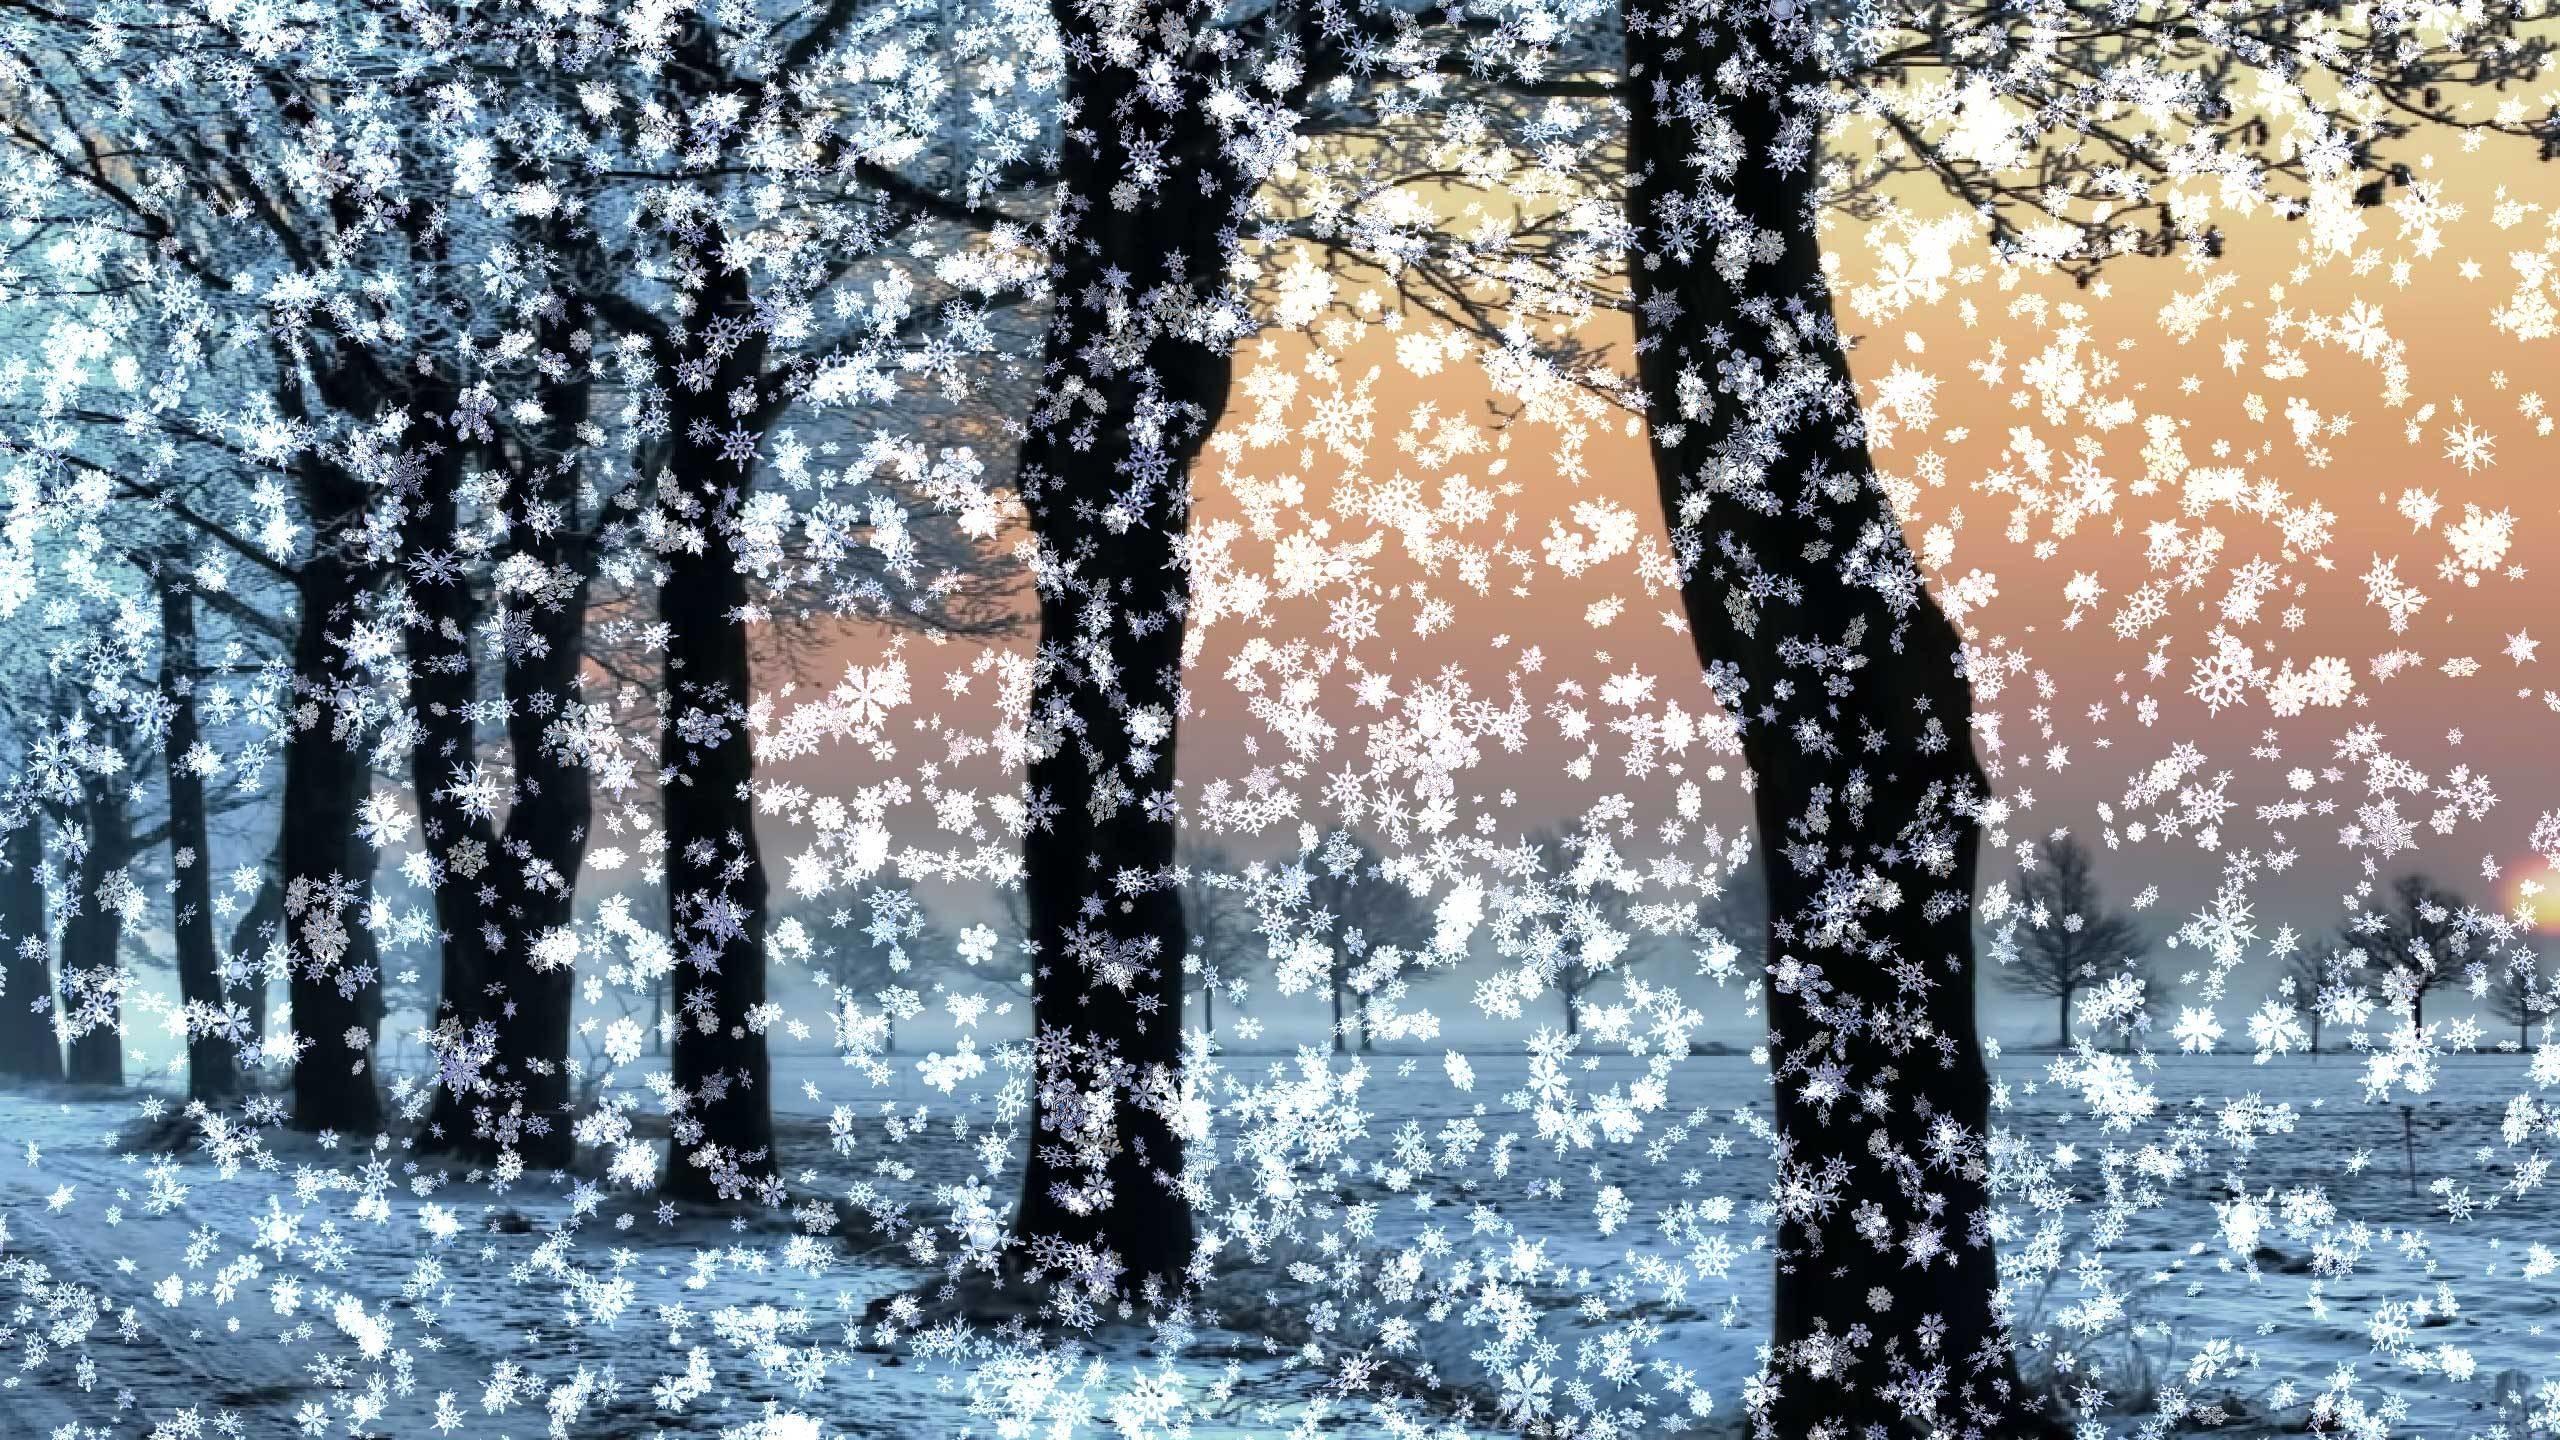 3d animated wallpaper windows 10 – Snowy Desktop 3d. Download